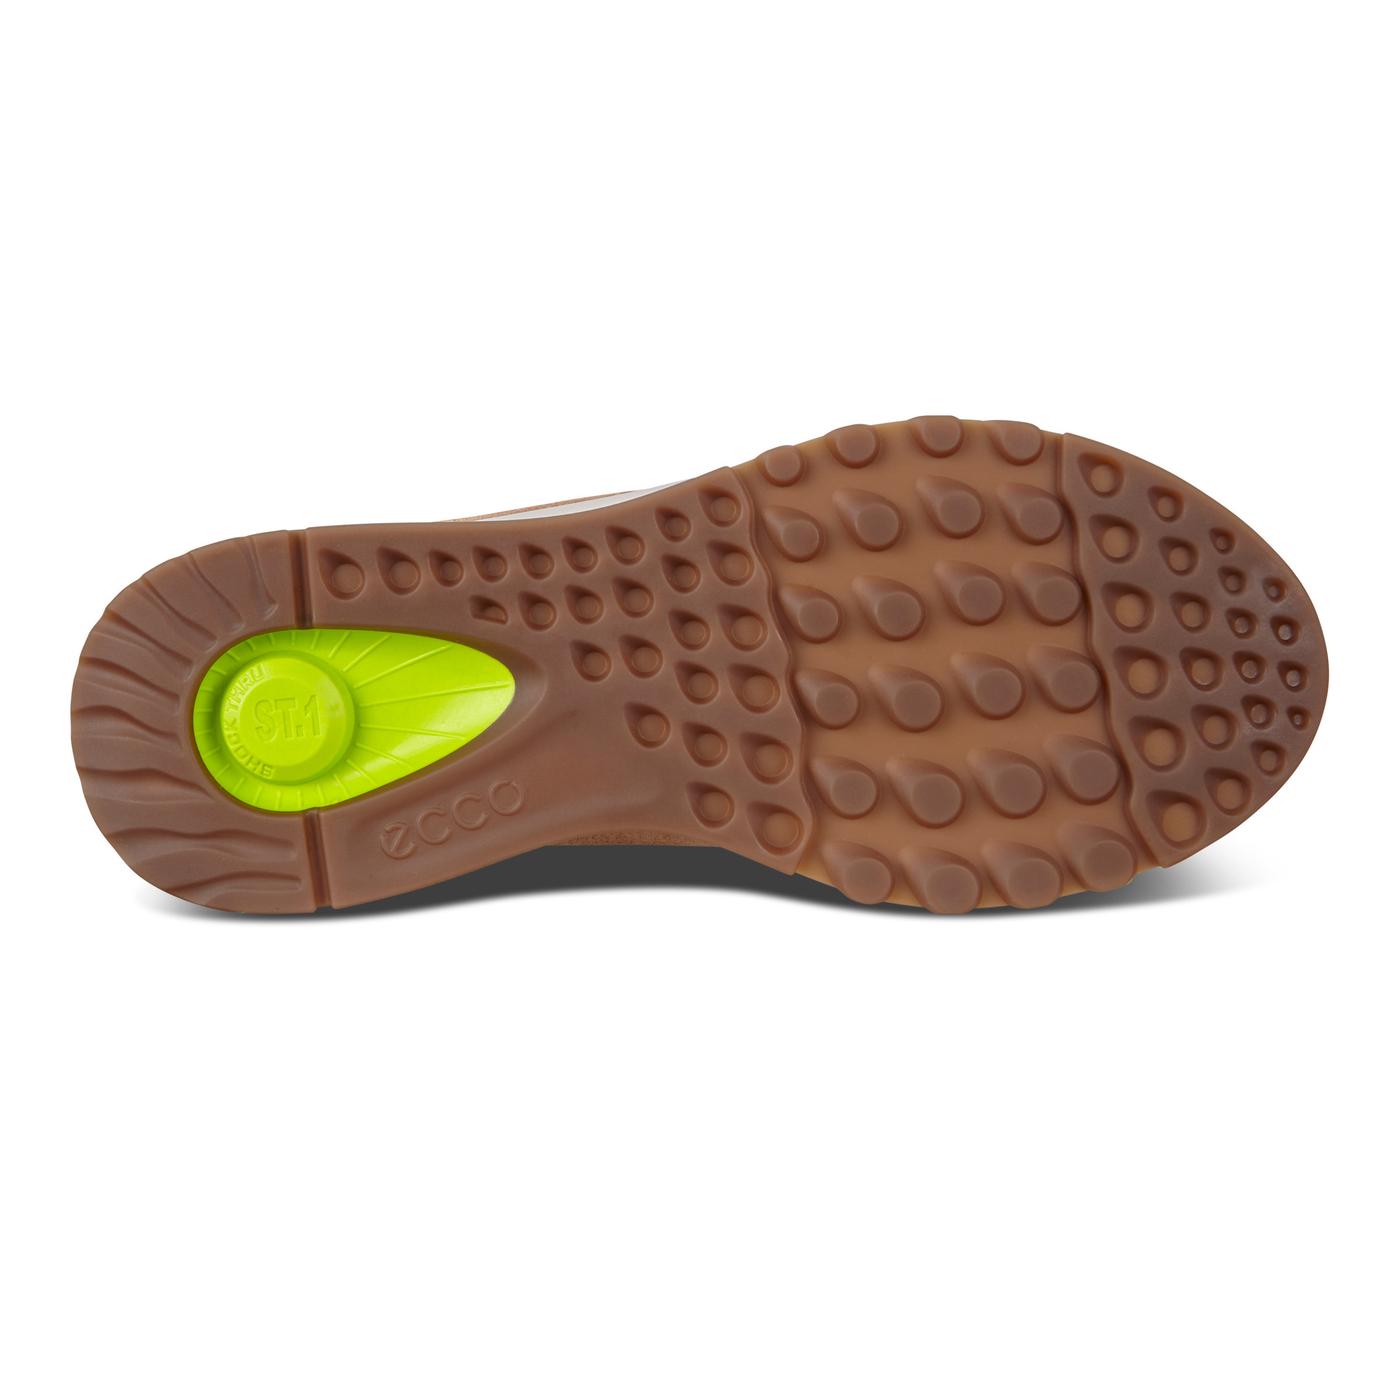 ECCO ST.1 W Sneaker Ankle-high